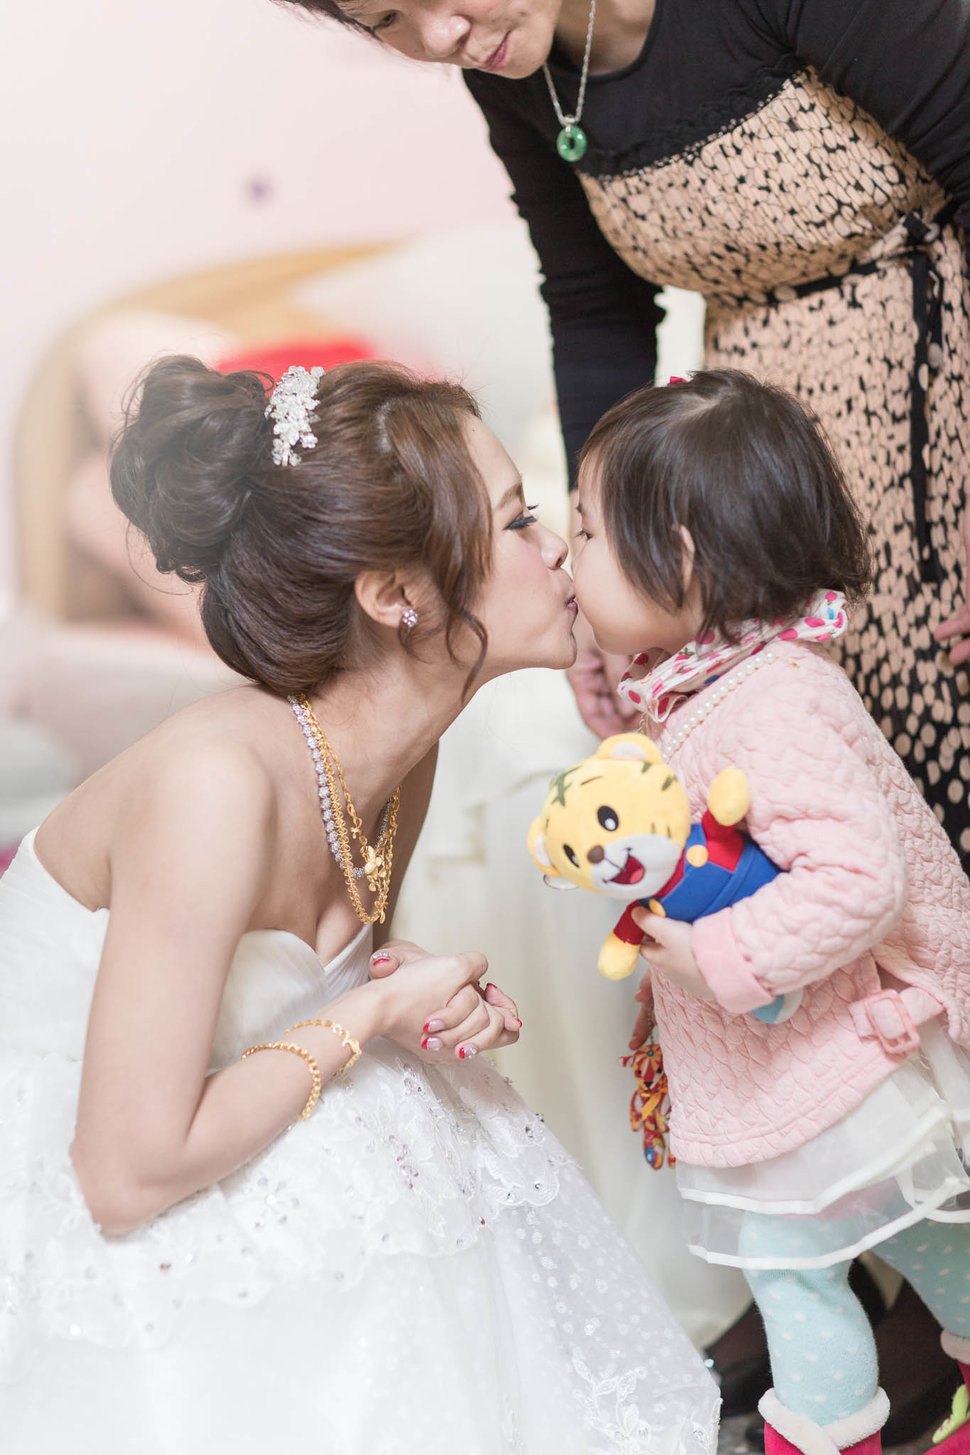 18PHOTO-TIM❤️ ROSA 結婚(編號:308300) - 18PHOTO 婚紗影像攝影工作室 - 結婚吧